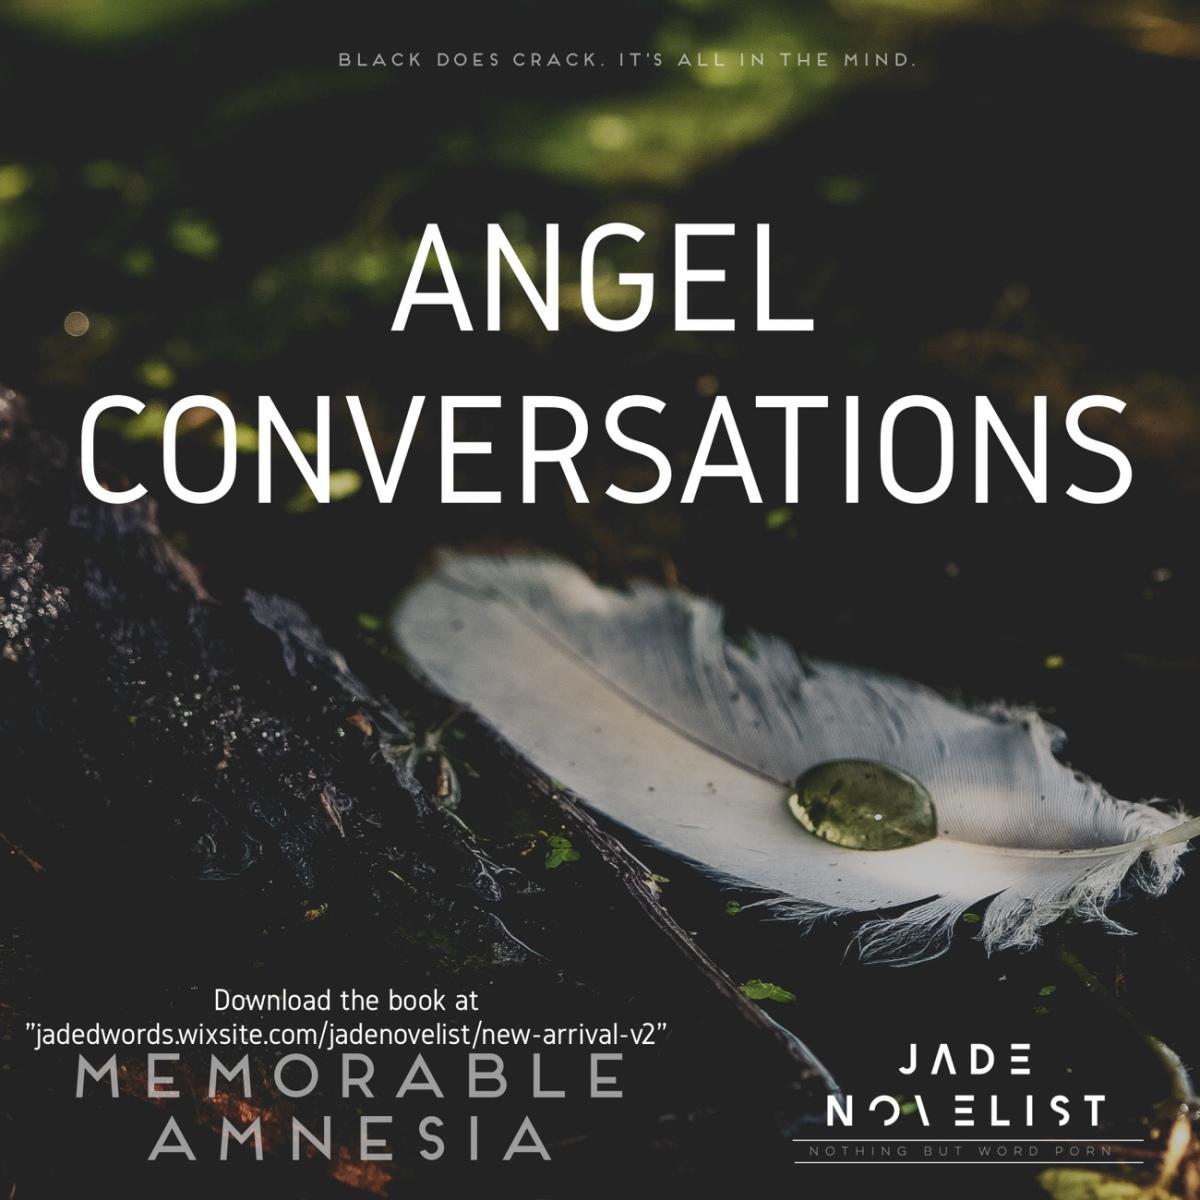 Angel Conversations